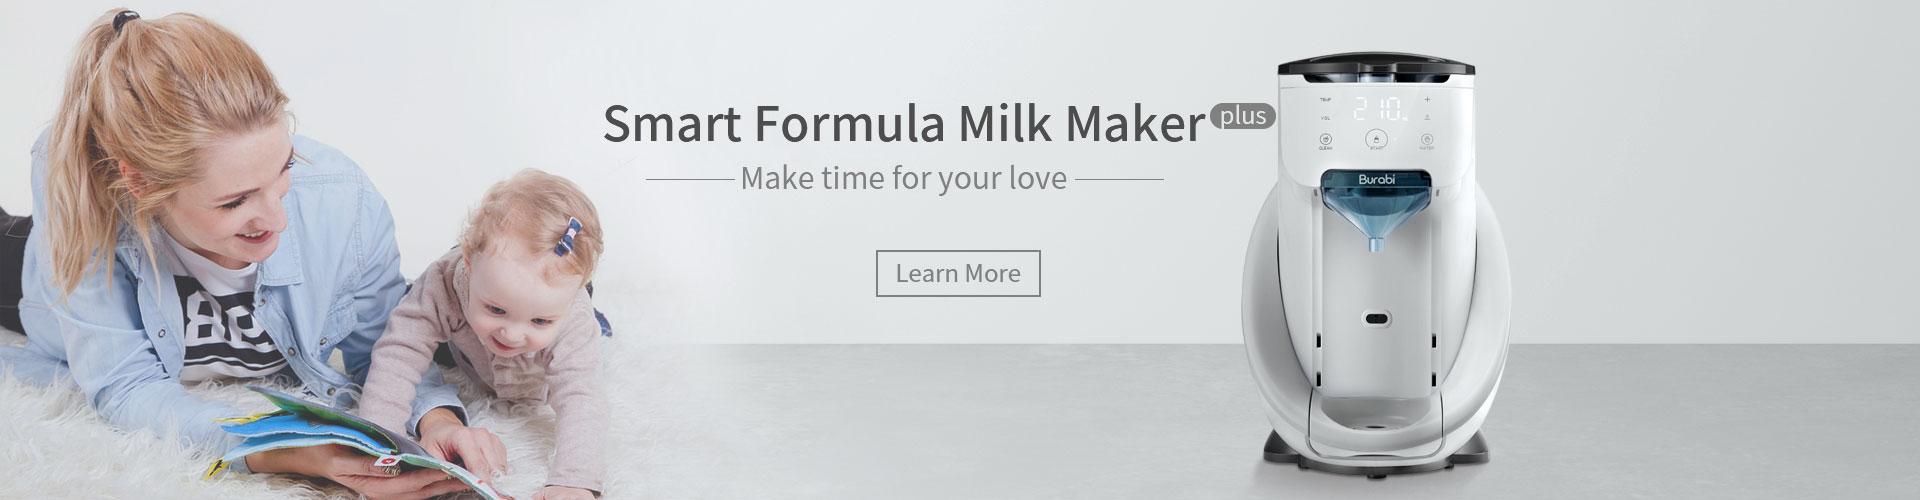 Smart fromula milk maker